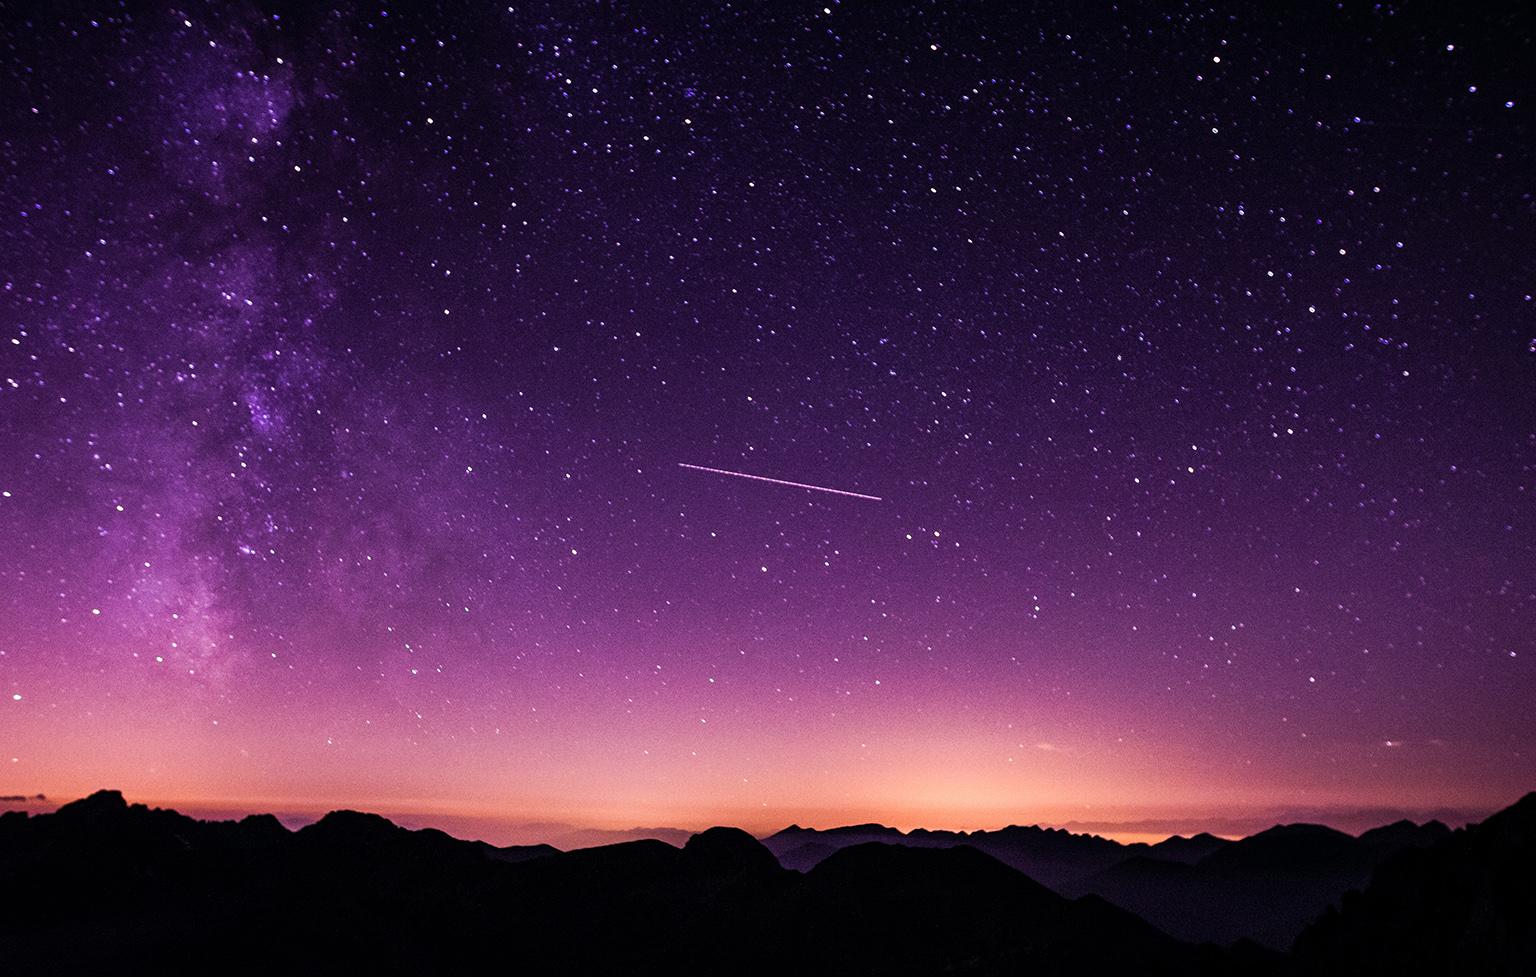 Overexposed night sky right before sunrise